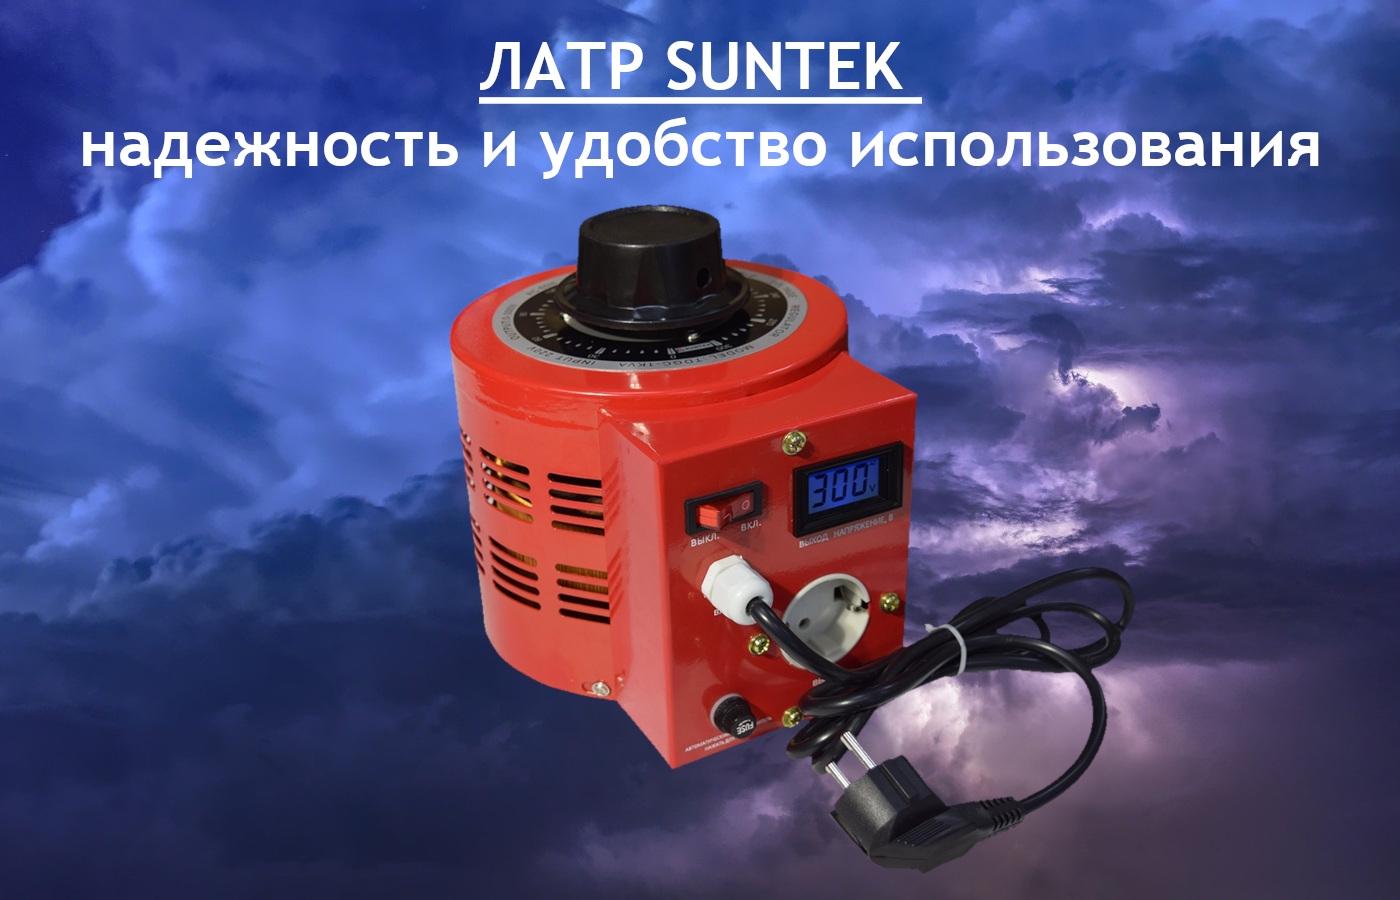 Особенности ЛАТР SUNTEK